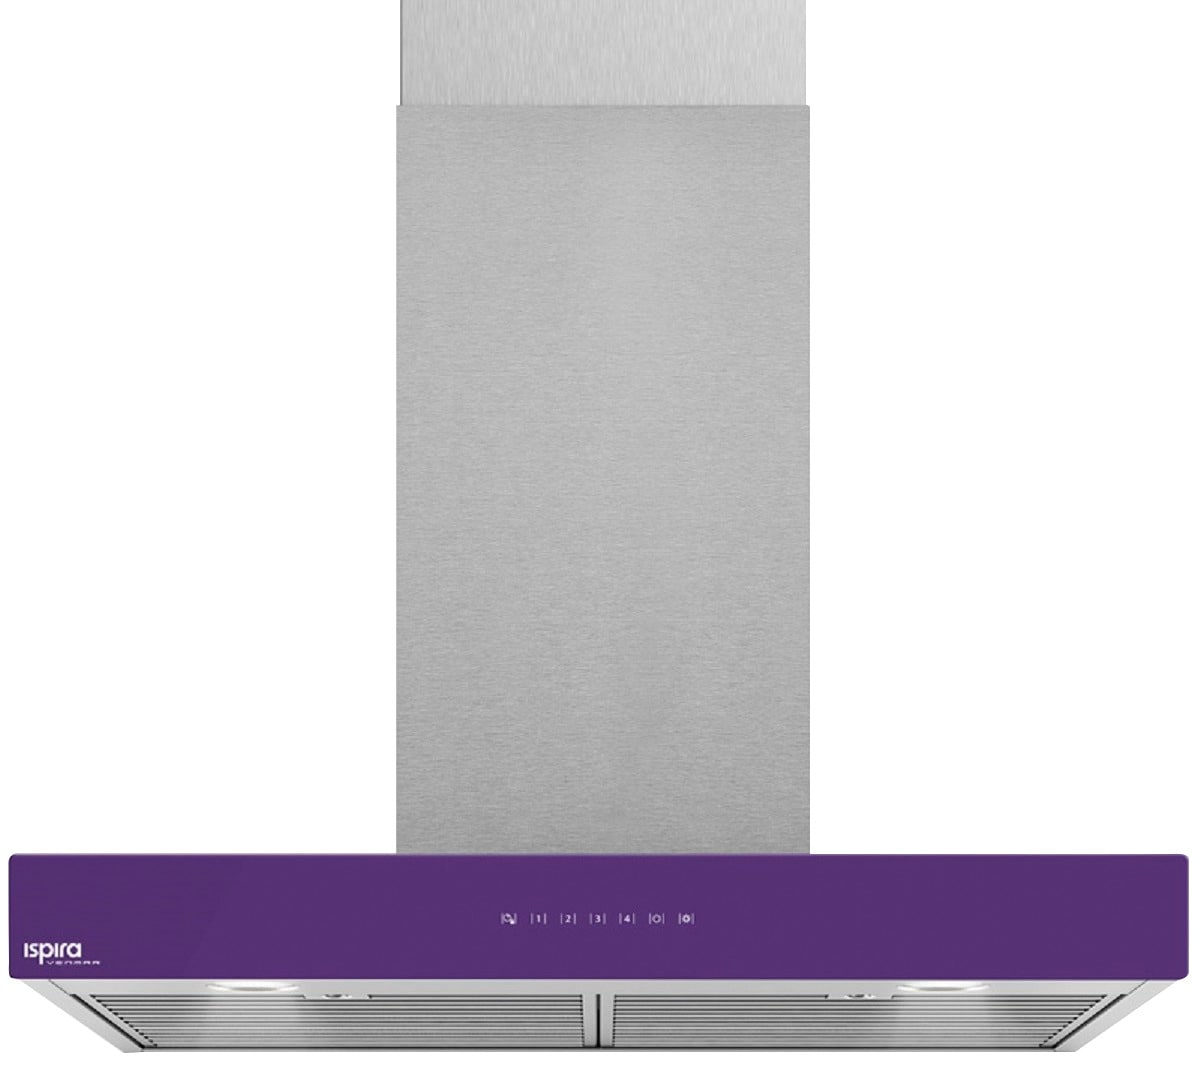 "Venmar Ispira 30"" Chimney Range Hood – Purple"